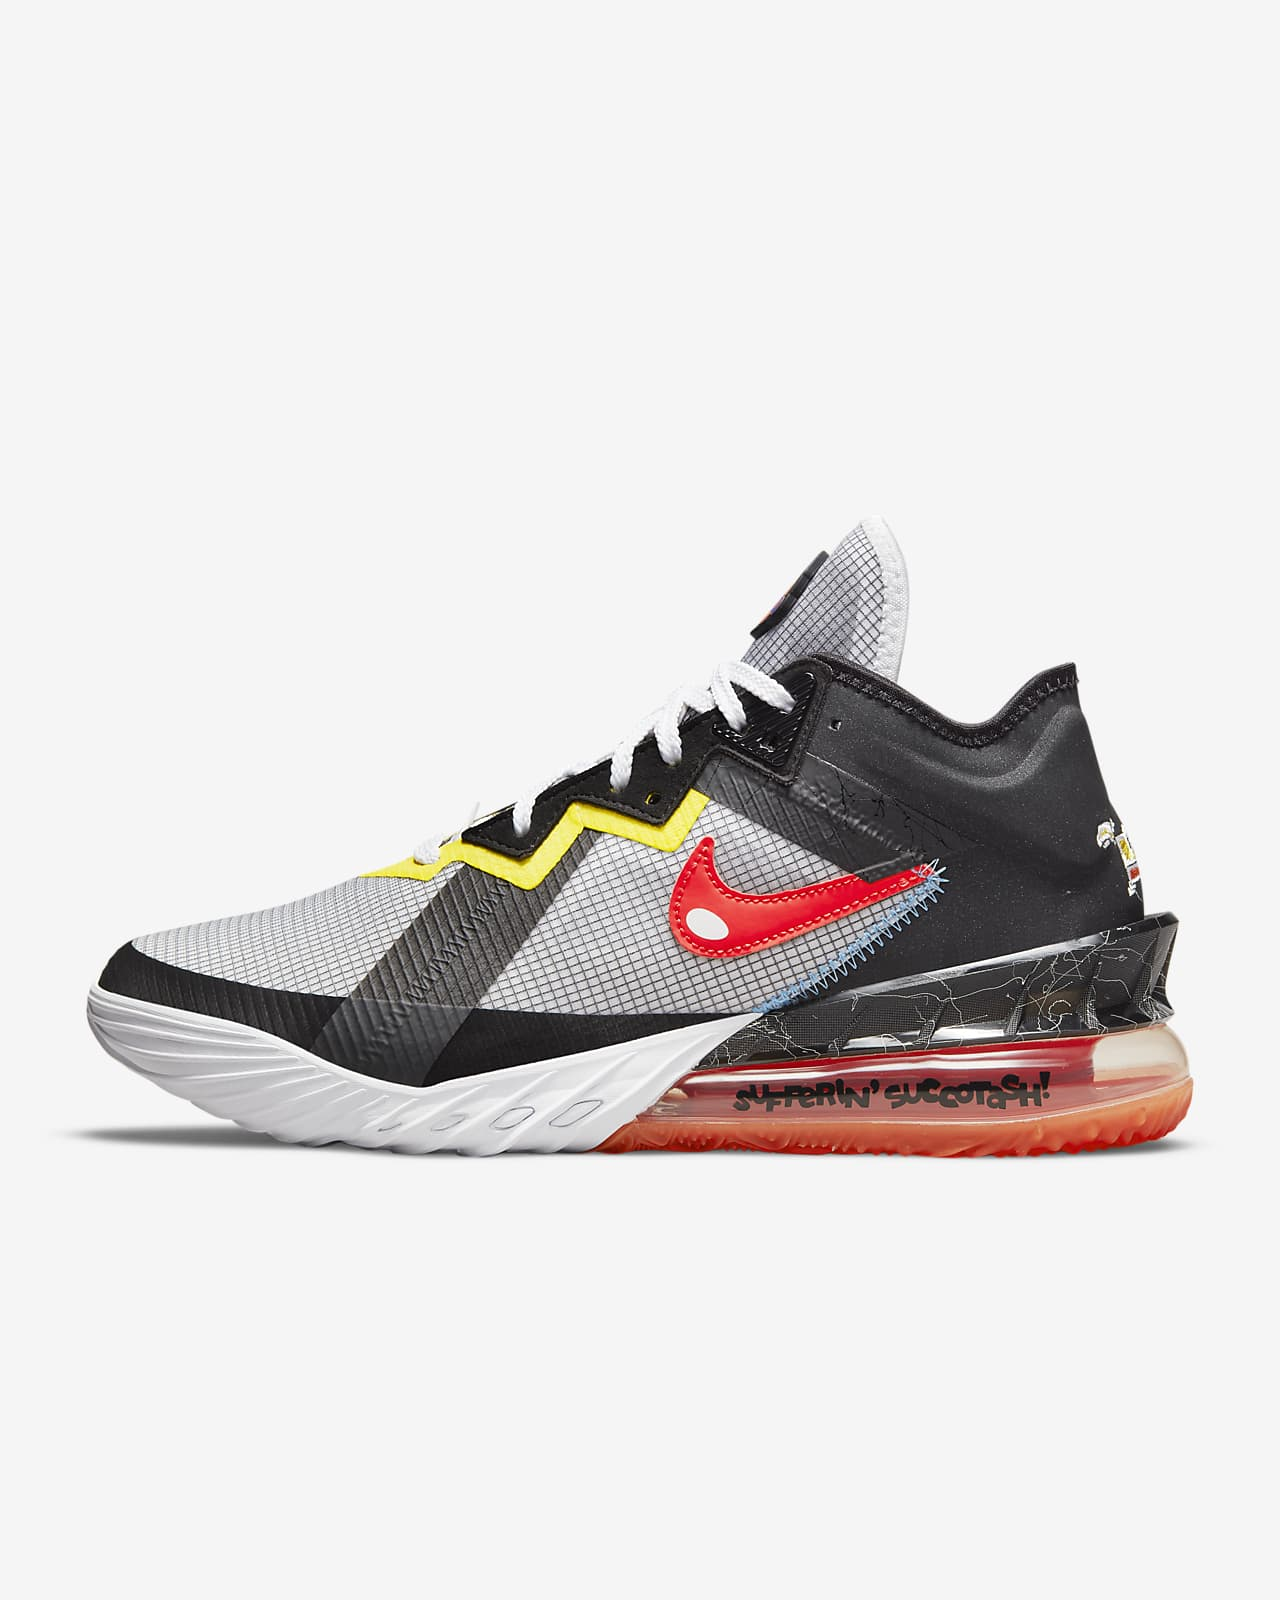 Chaussure de basketball LeBron18 Low «Sylvester vs Tweety»